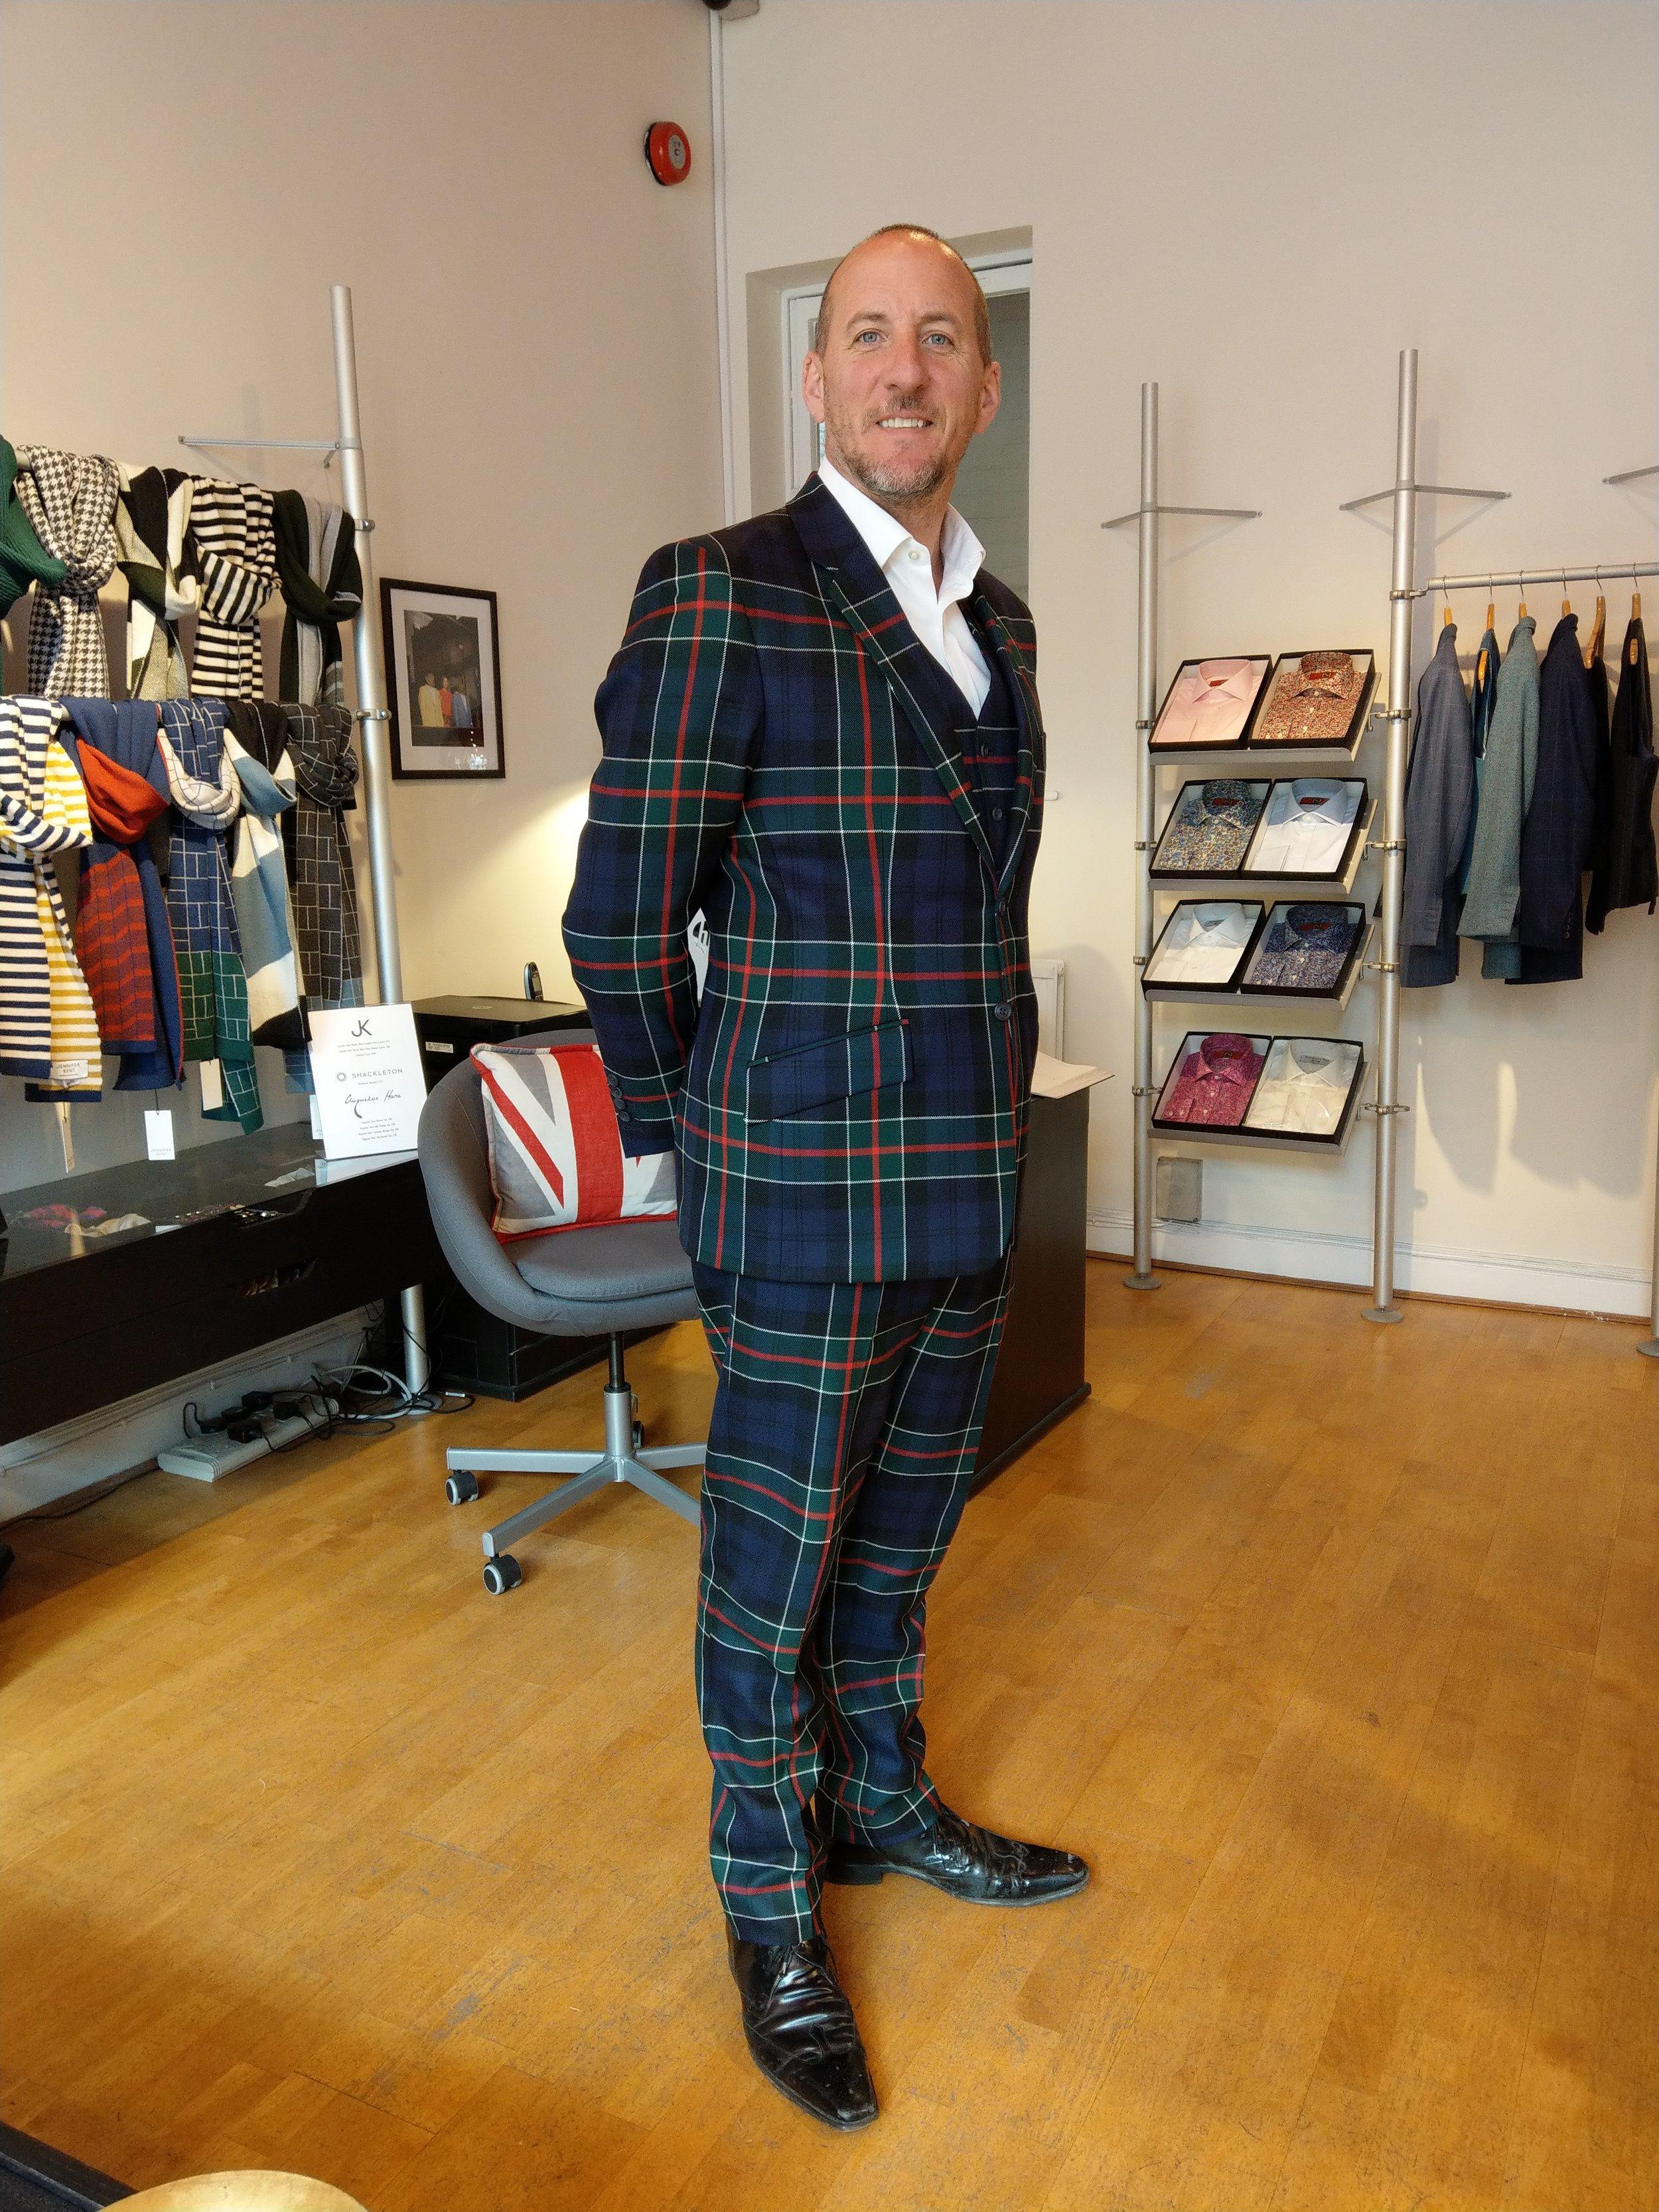 susannah-hall-tailor-tartan-suit-dugdale-style-made-uk-british.jpg